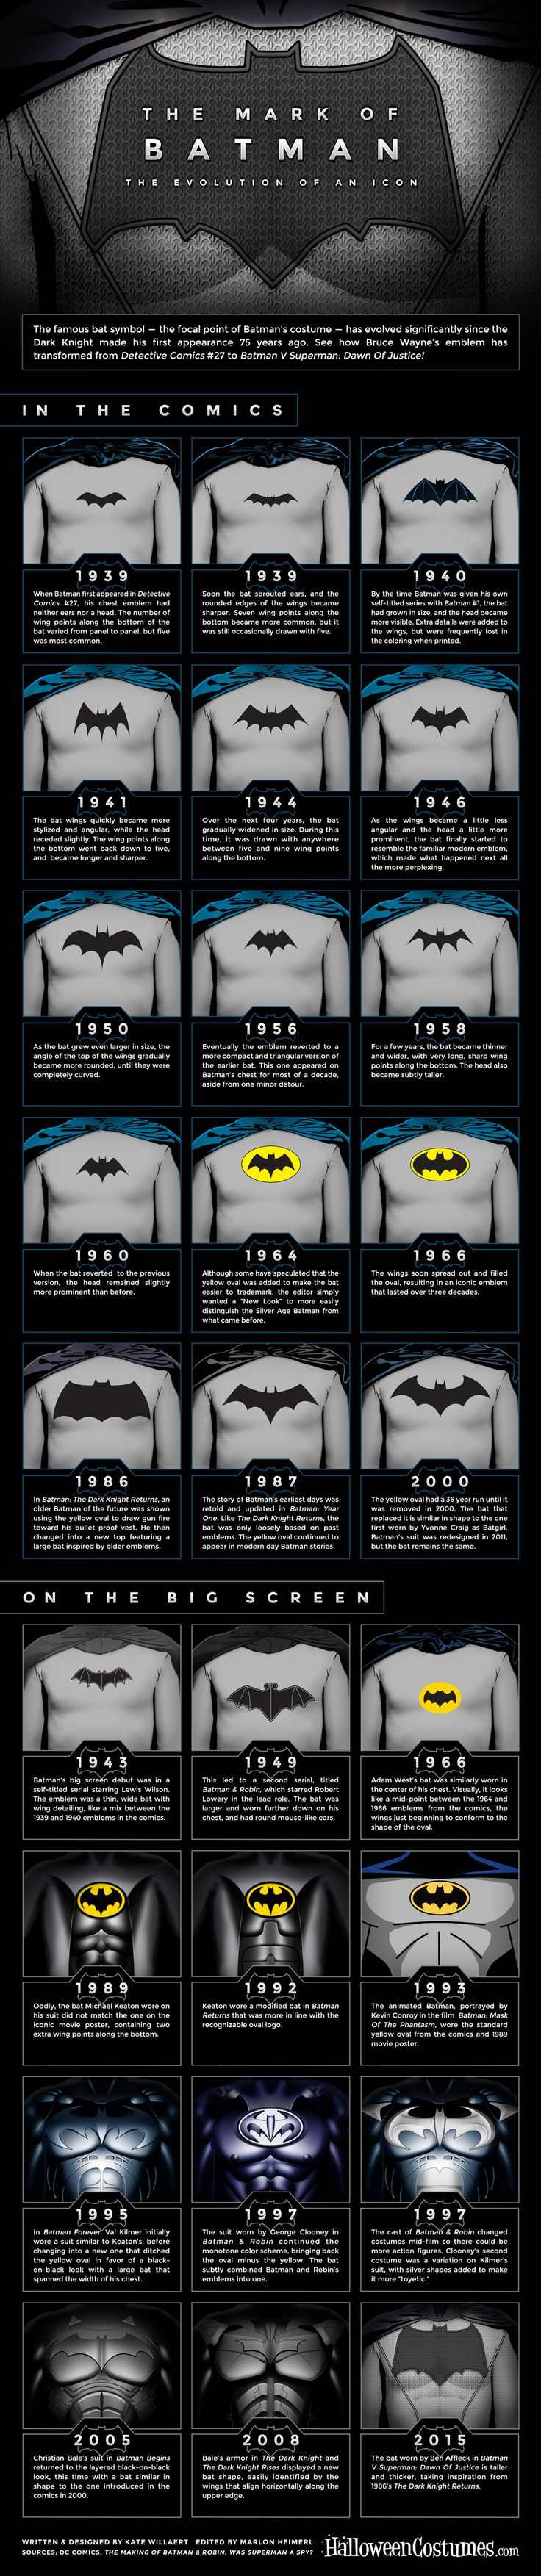 18 best Batman images by Eric Smith on Pinterest